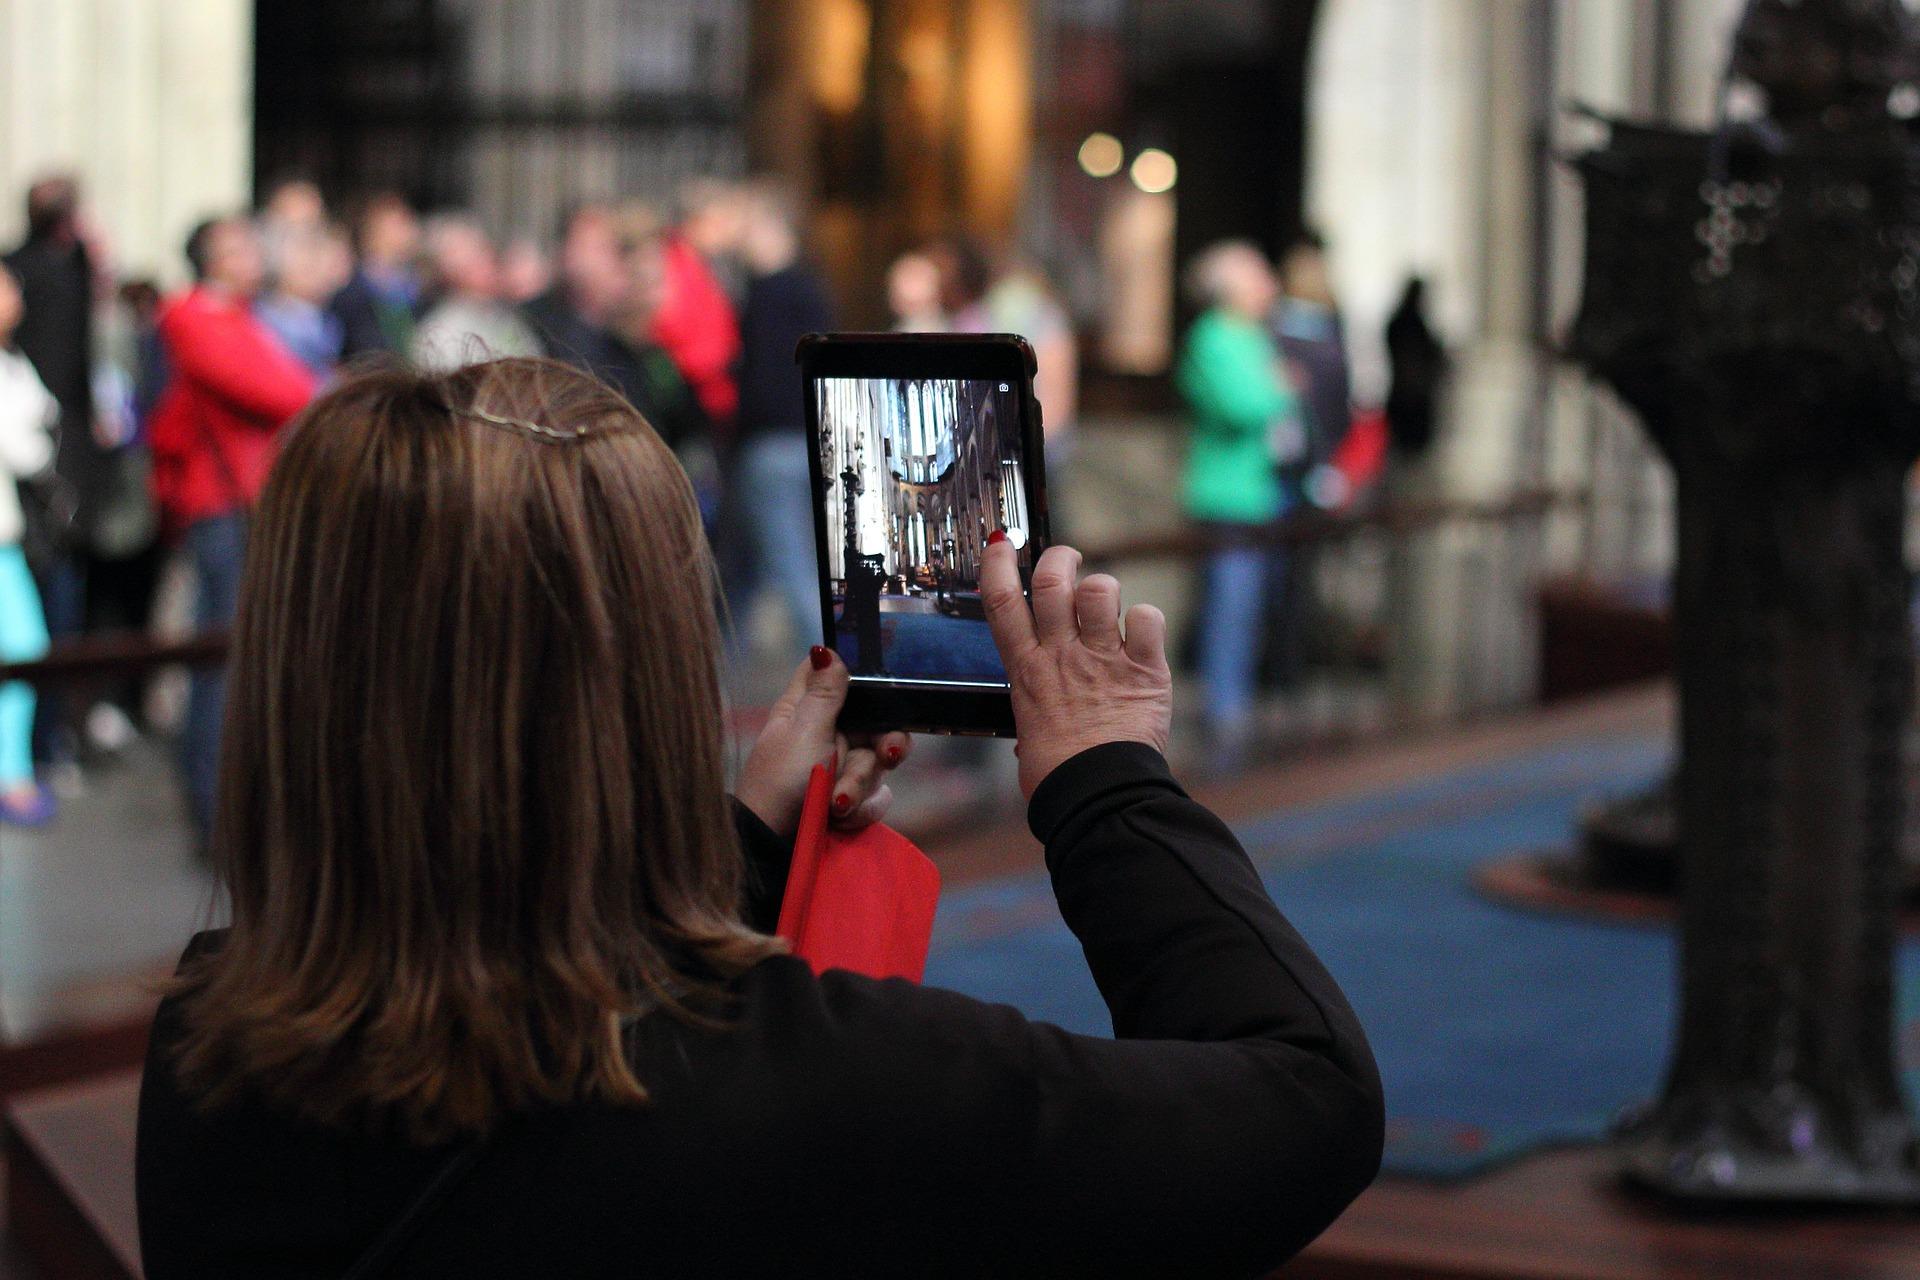 turista fotografiando